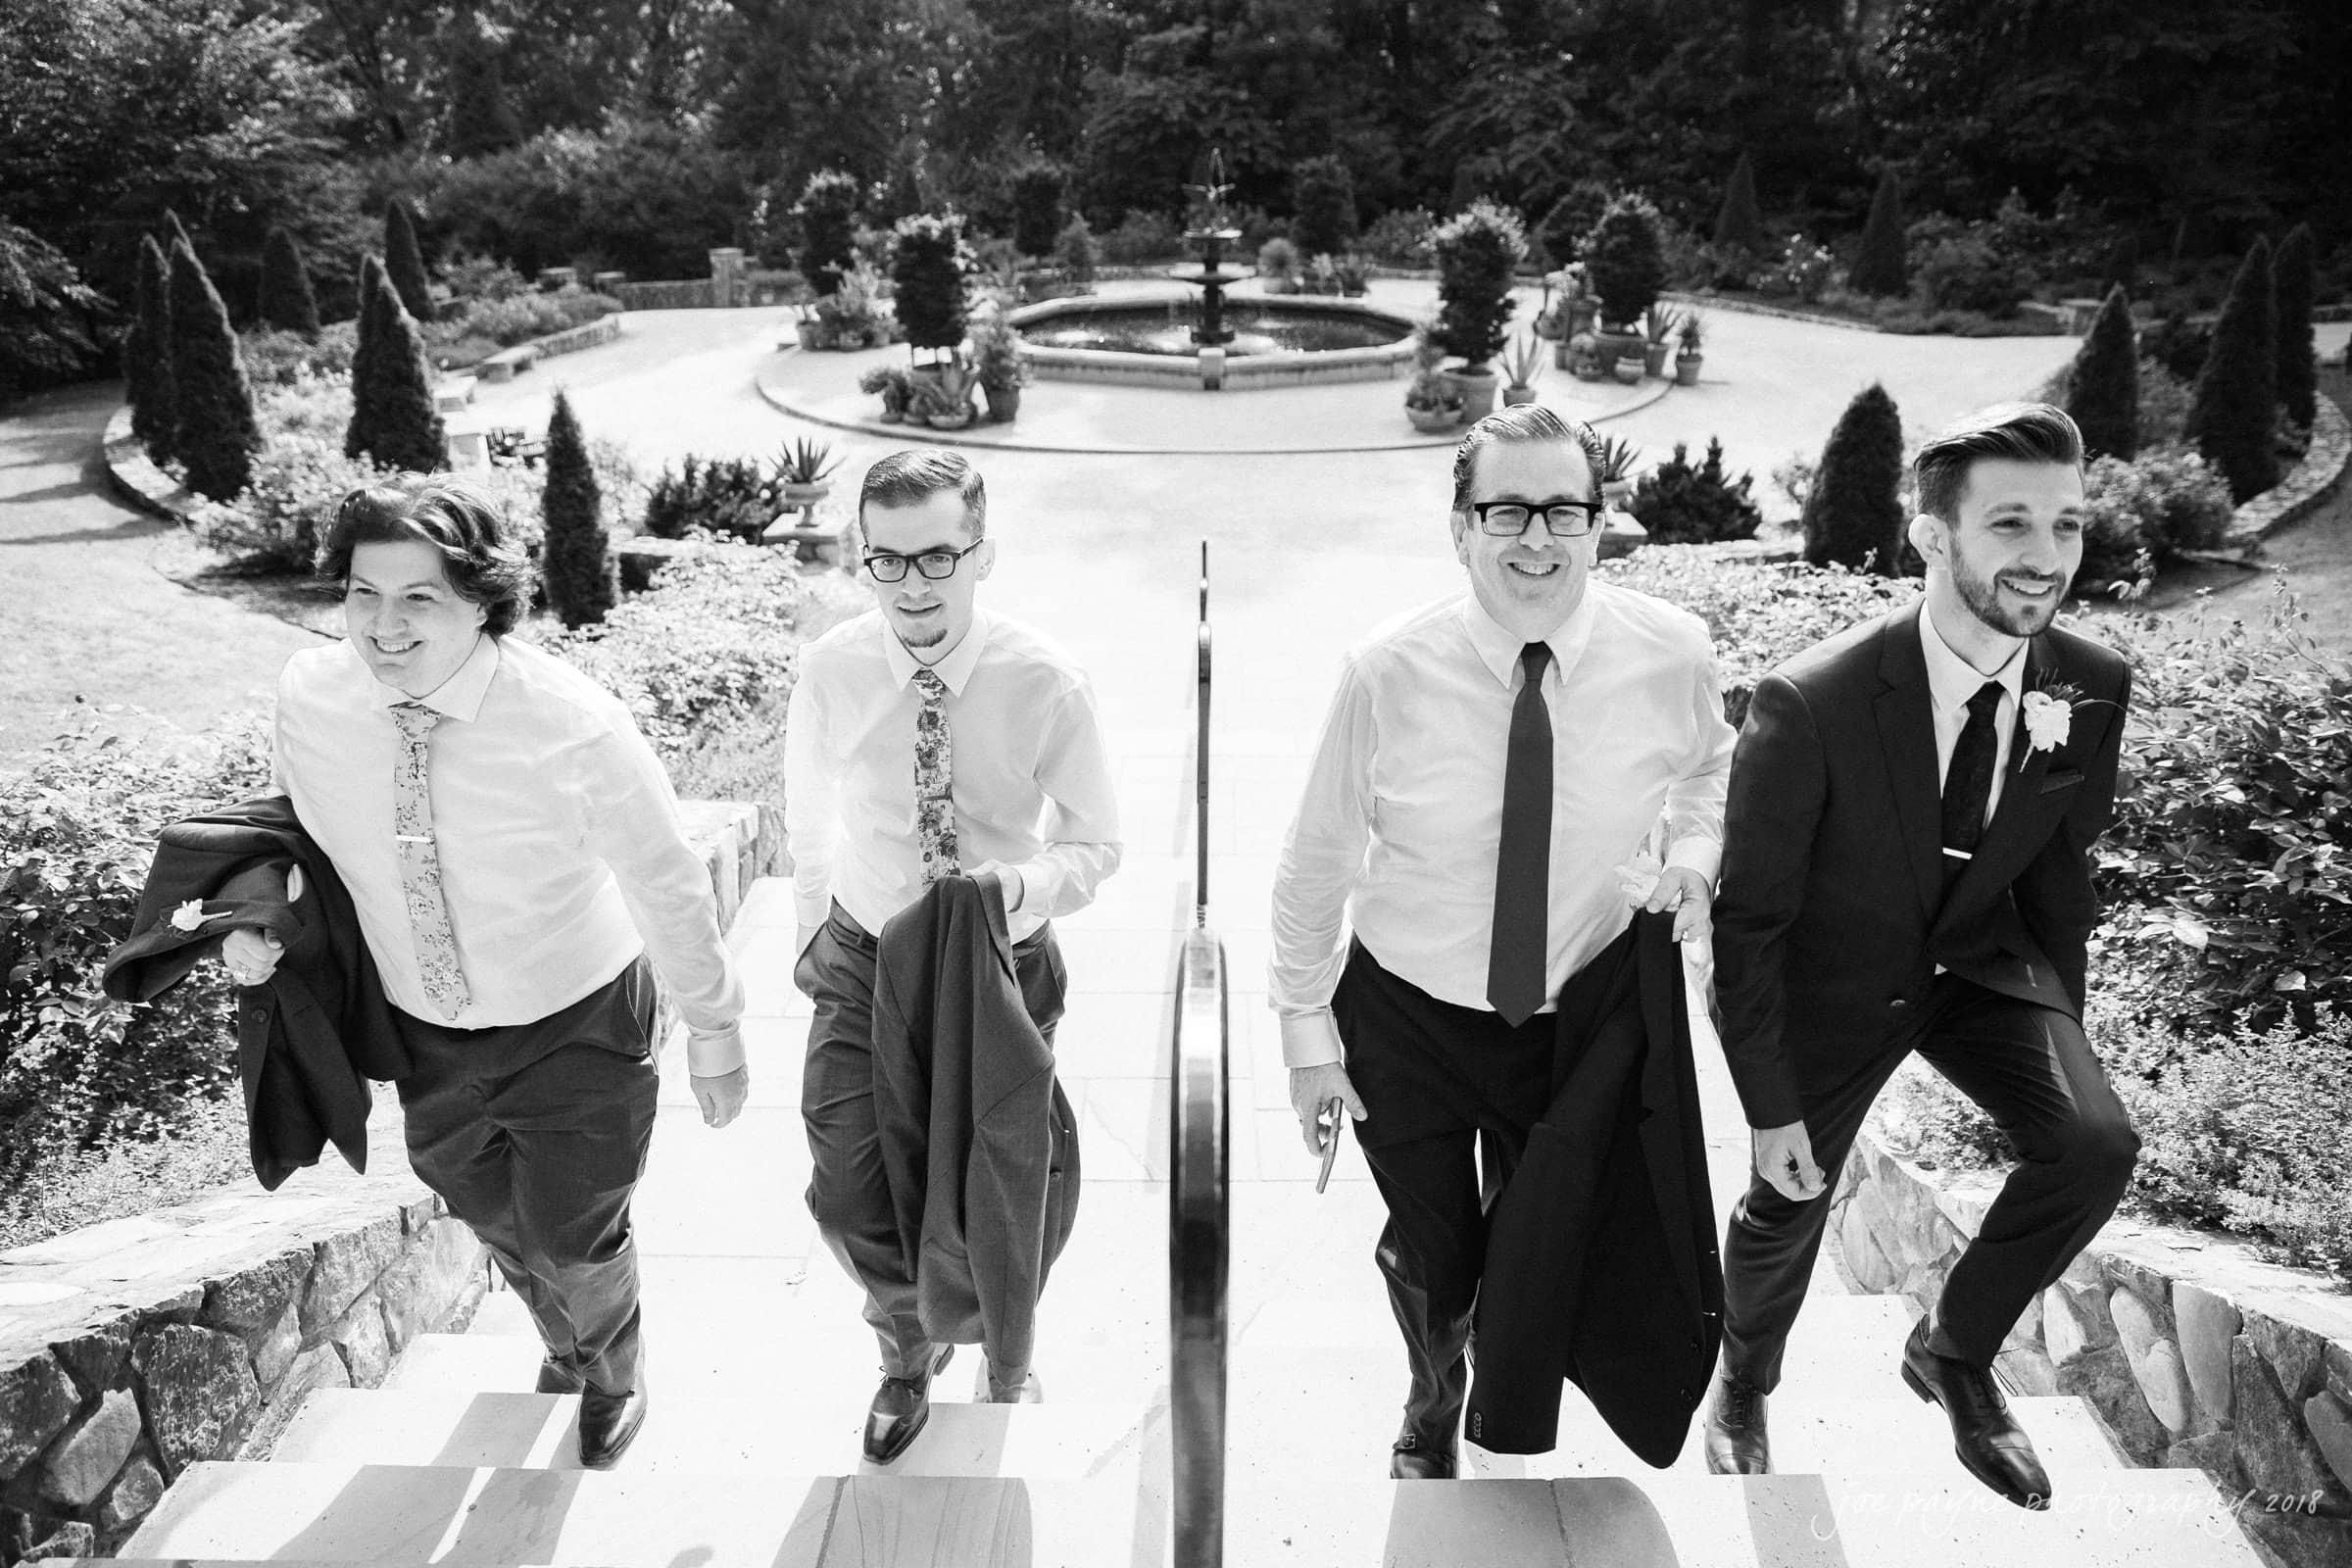 Duke Gardens Wedding - Ricky and brothers walking B&W